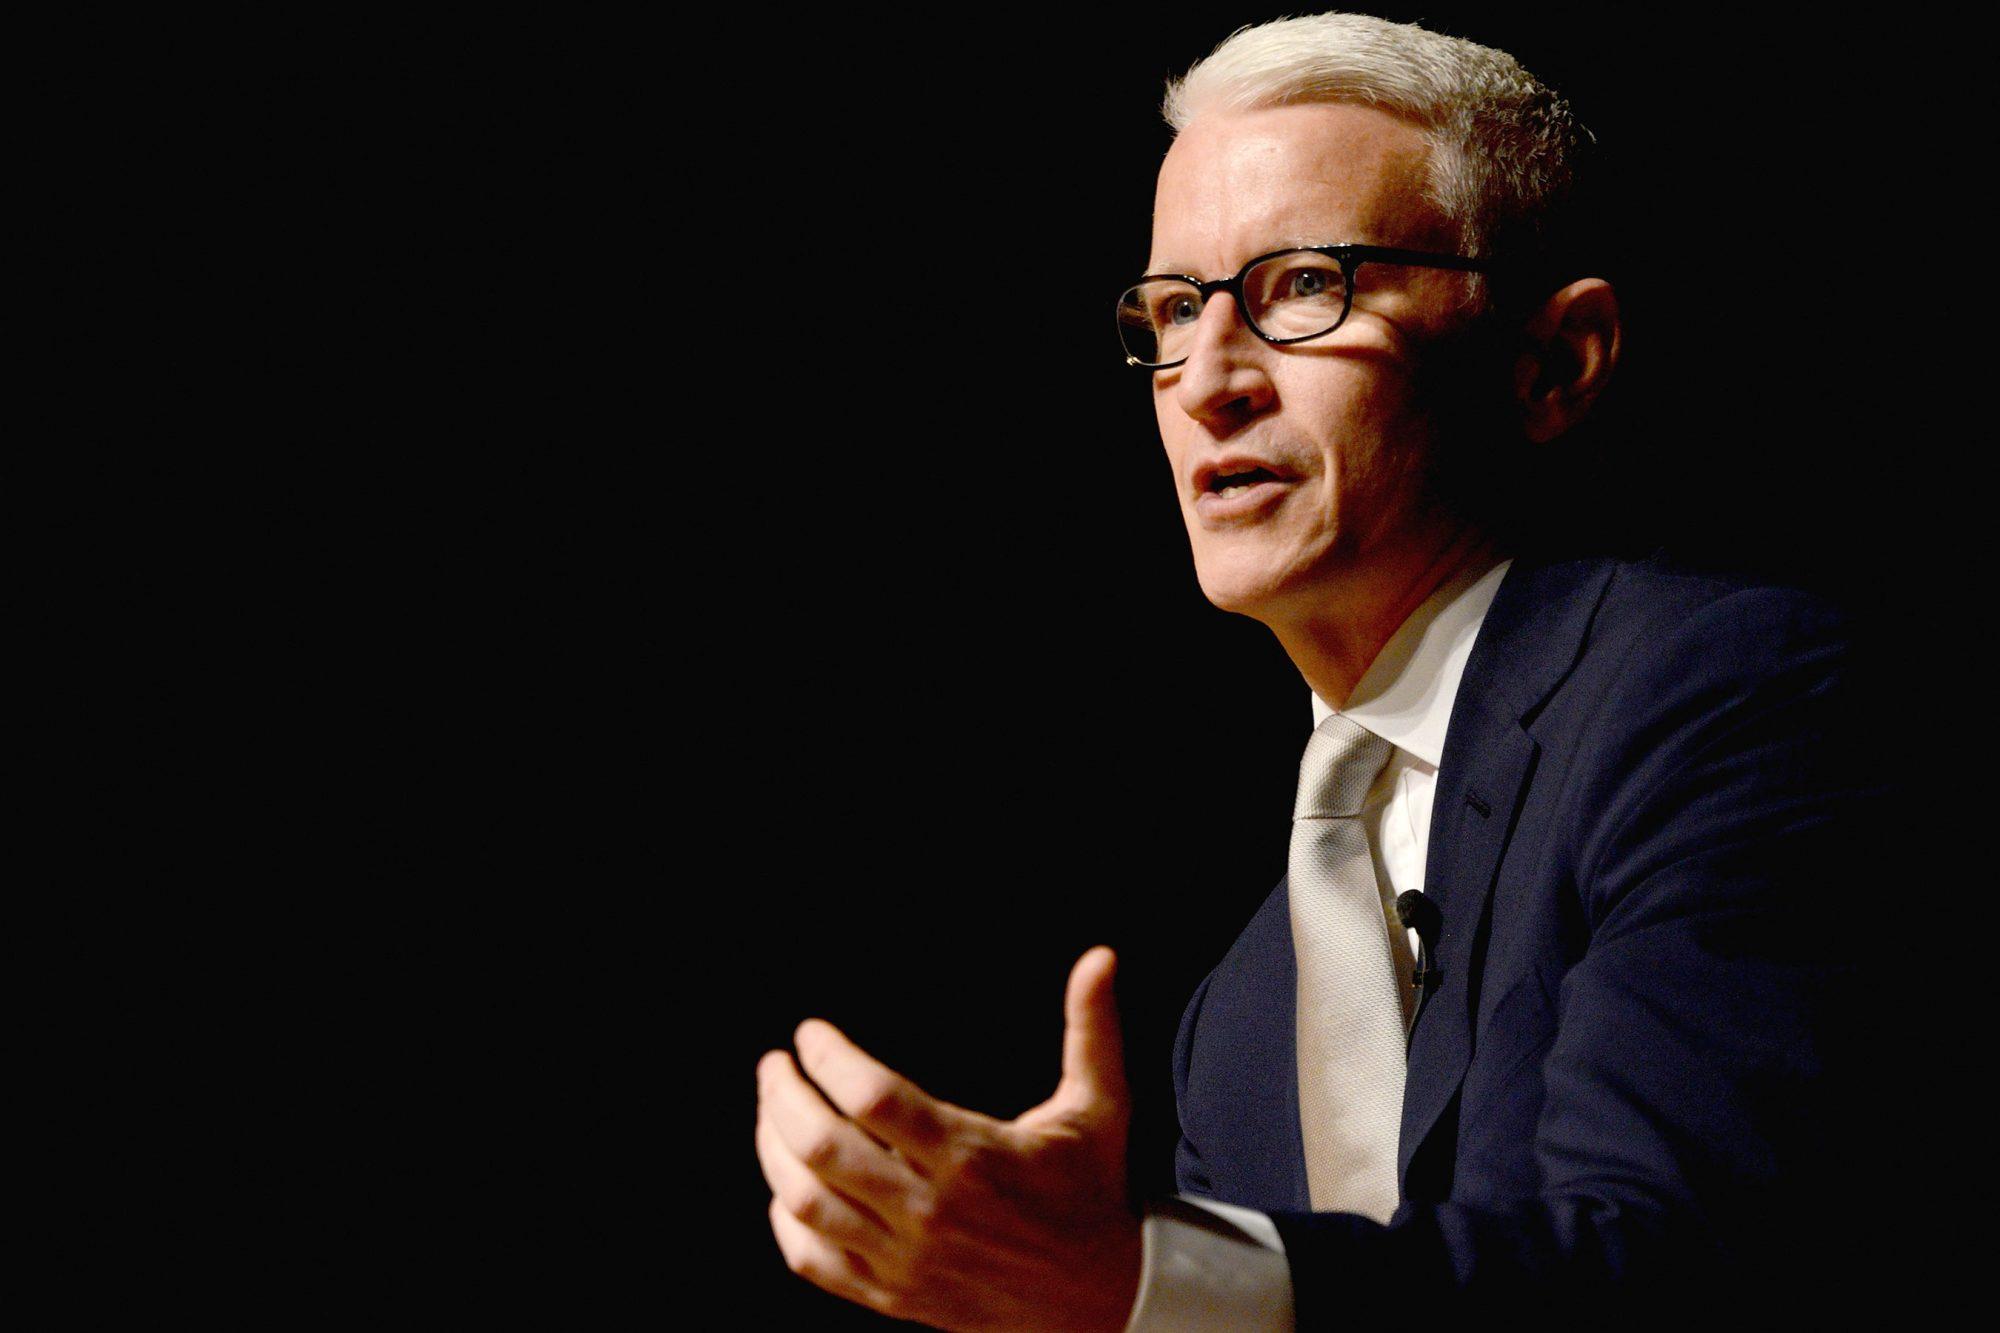 Anderson Cooper Speaks At The Norfolk Forum 2015-2016